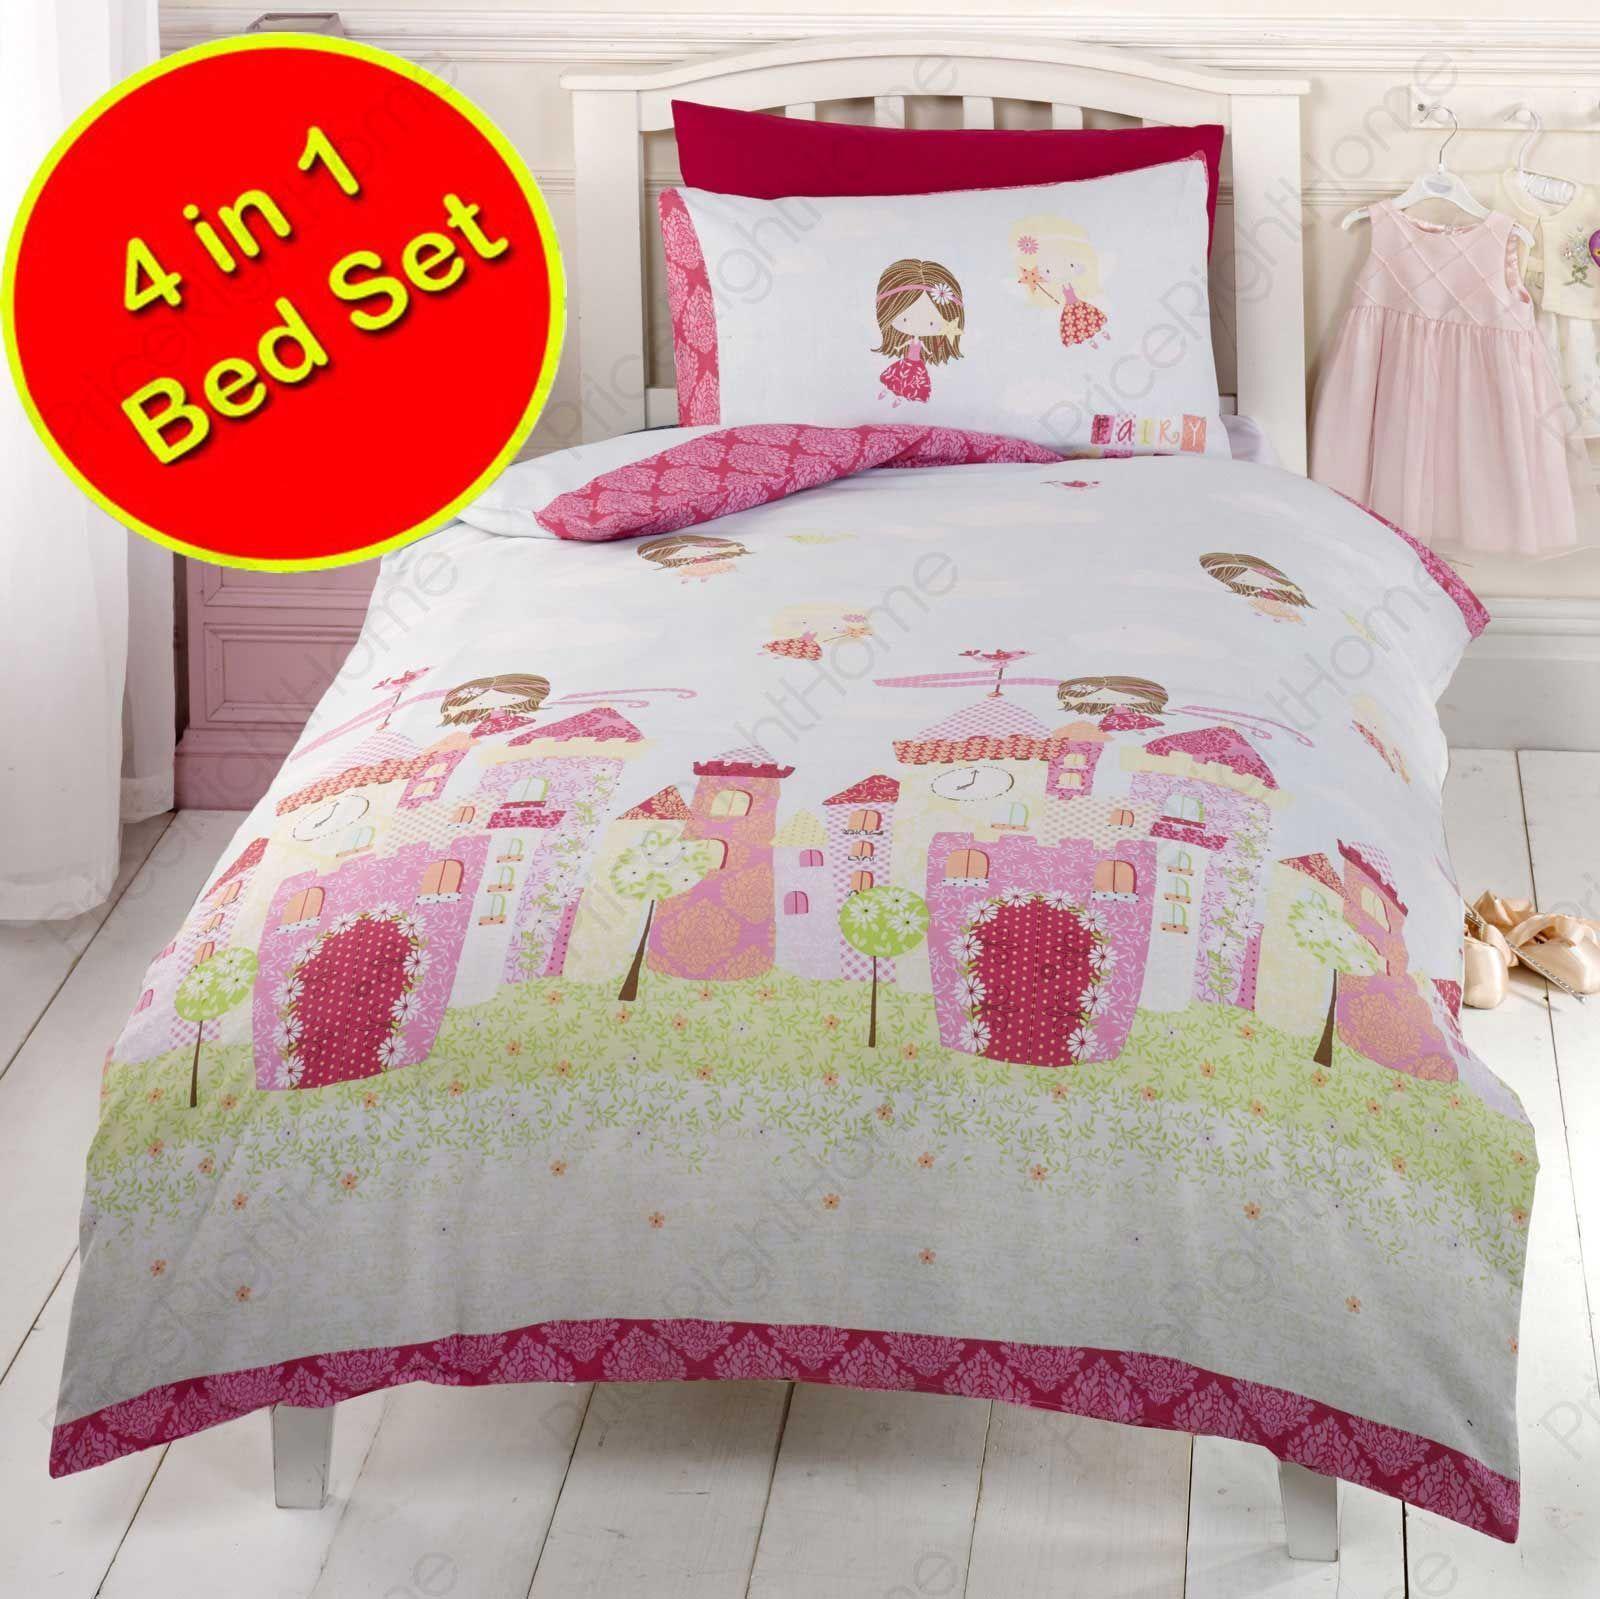 Fee Schloss 4-in-1 junior-bettwäsche-bündel Bettbezug Set | Elegantes Aussehen